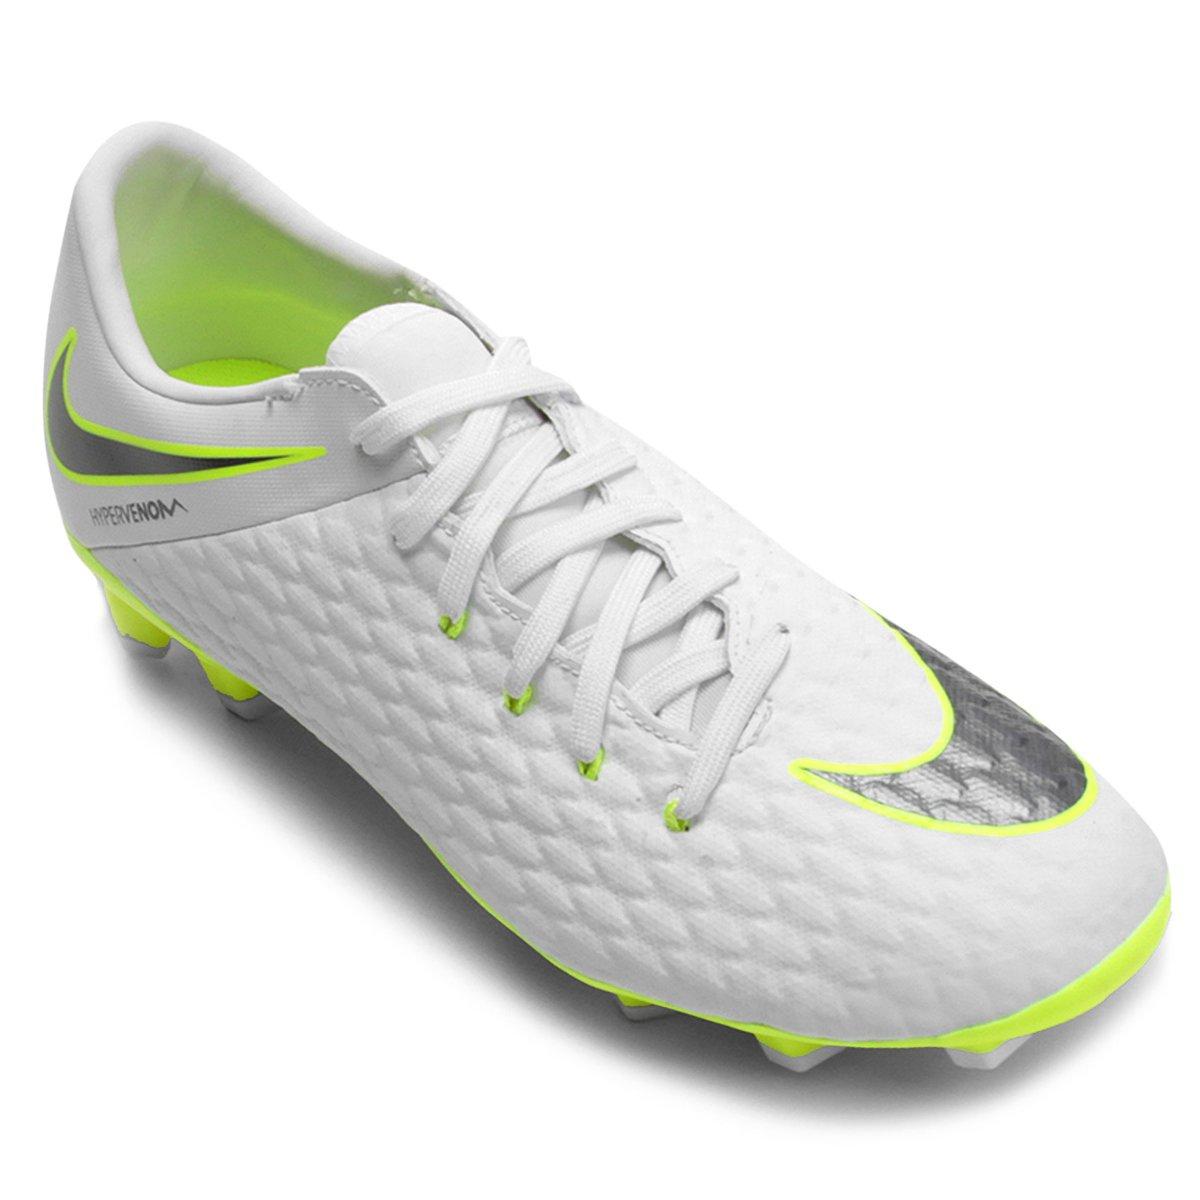 Chuteira Campo Nike Hypervenom Phantom 3 Academy FG - Branco e Cinza ... 7f83f90d93142